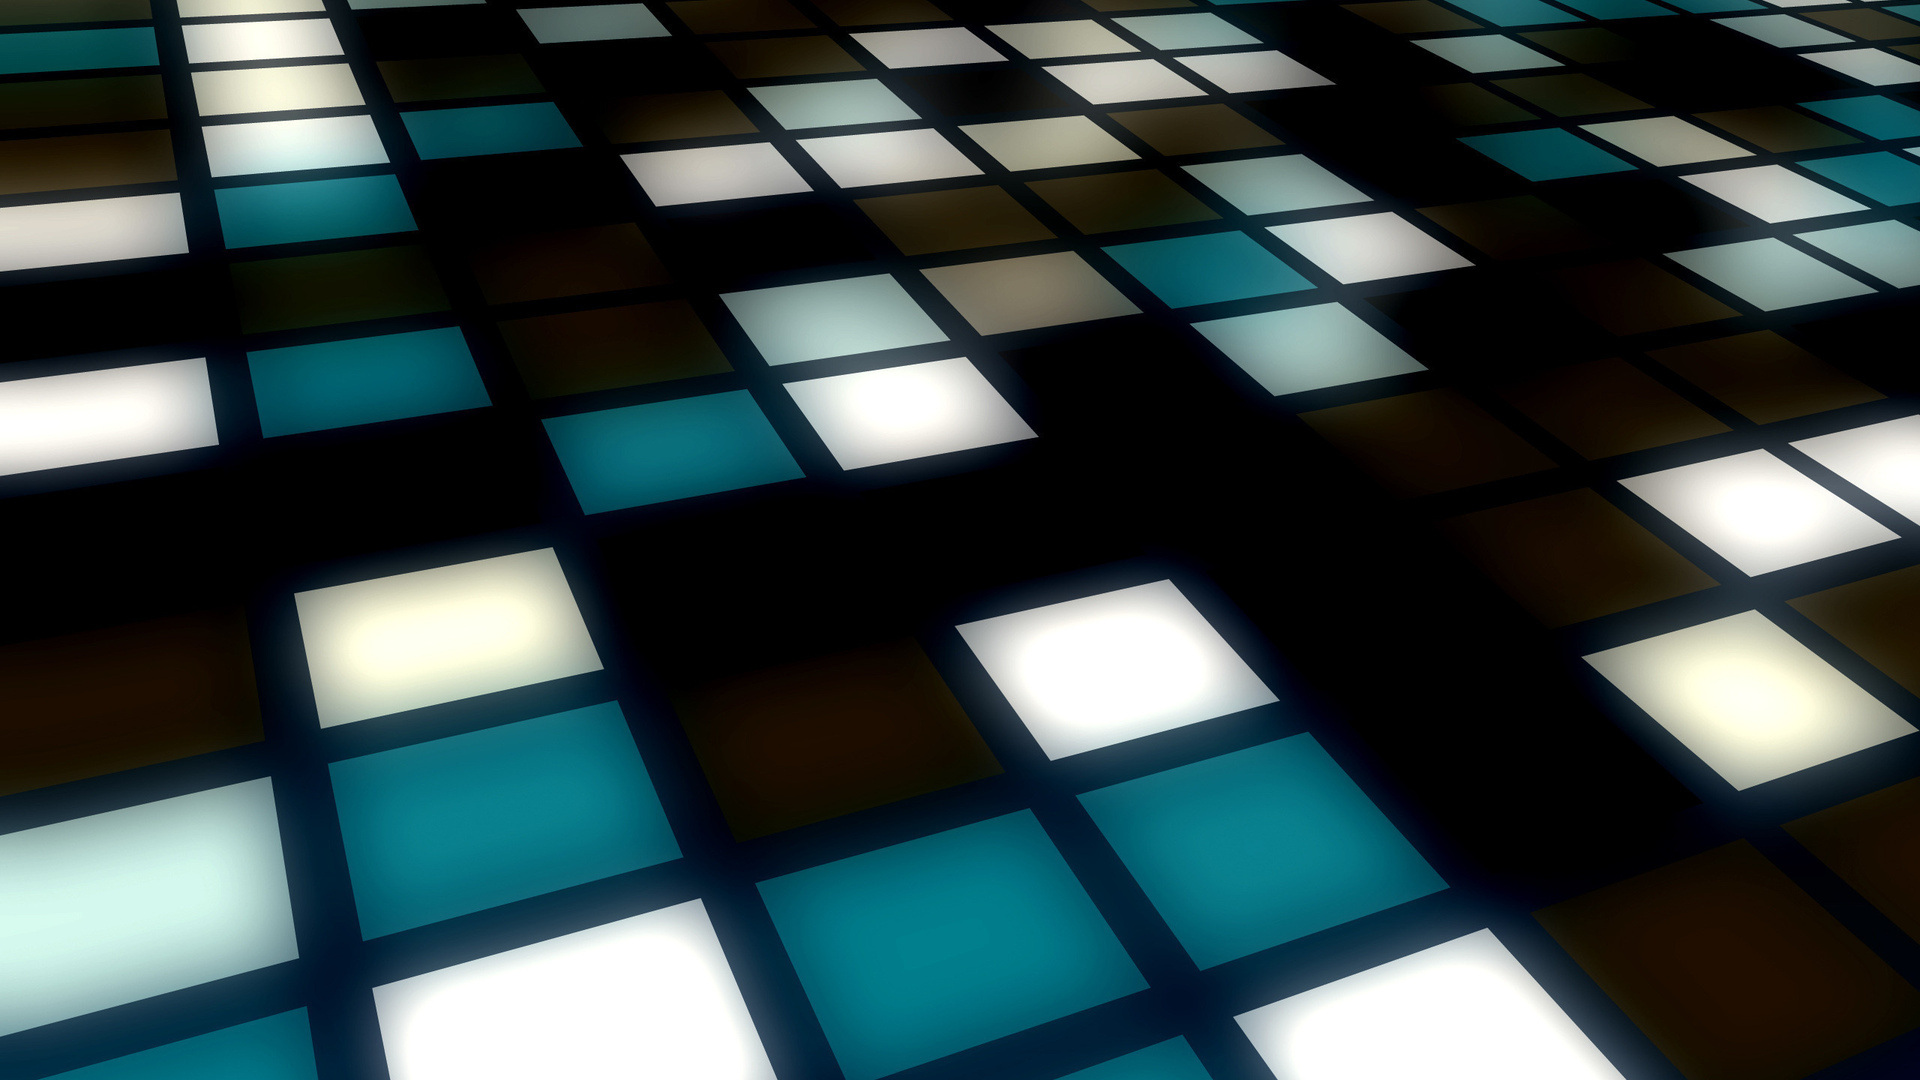 фотки в квадратиках